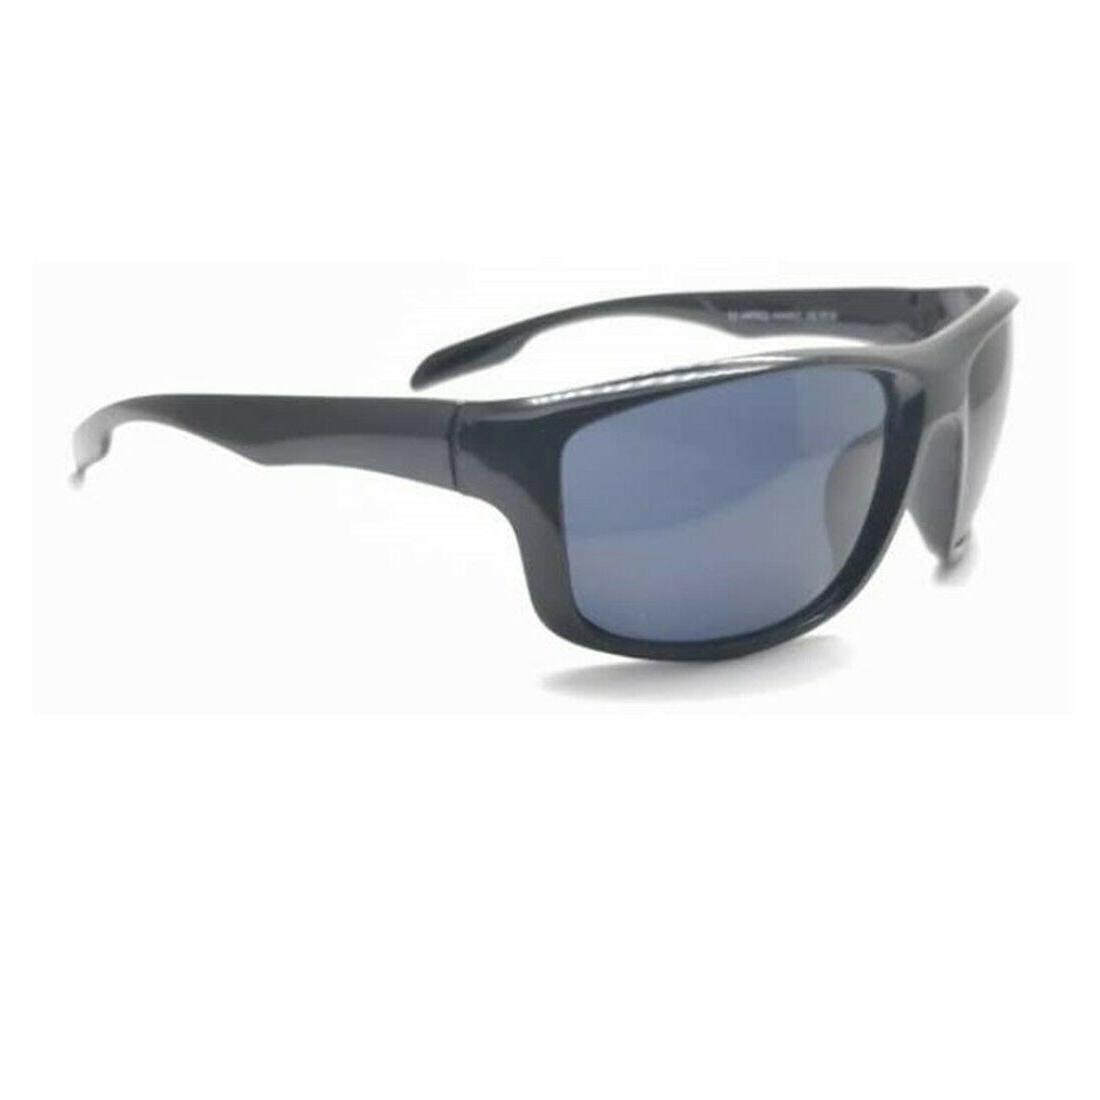 Bulk Lots 12 pc Wholesales Men Women Sports Eye Sunglasses